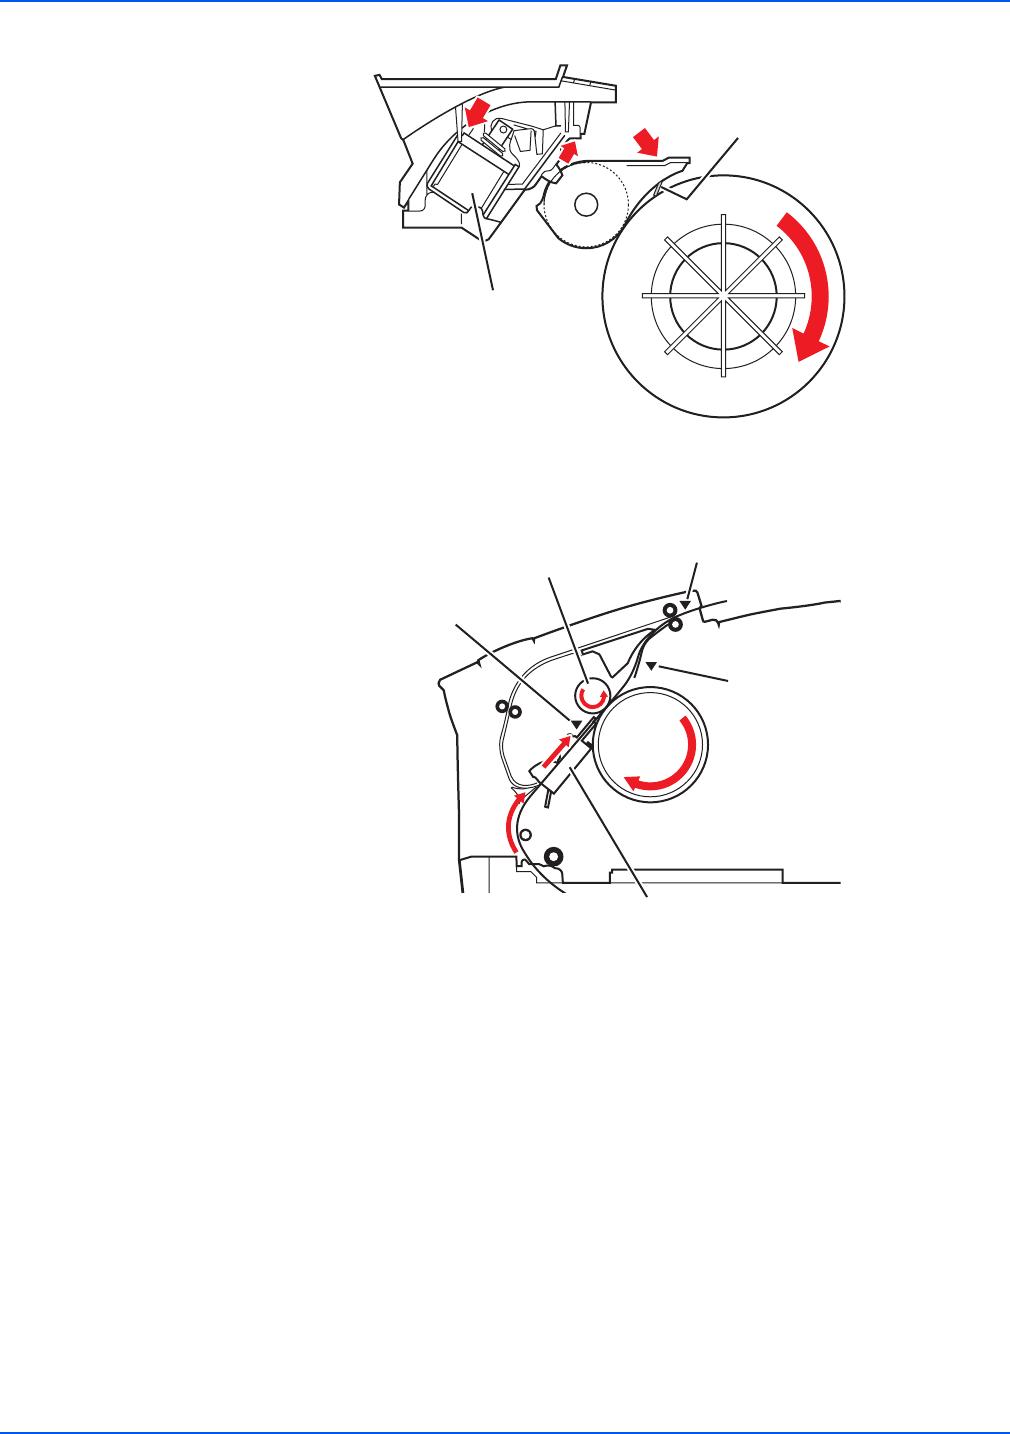 Phaser 8400/8500/8550/8560 Color Printer Service Manual